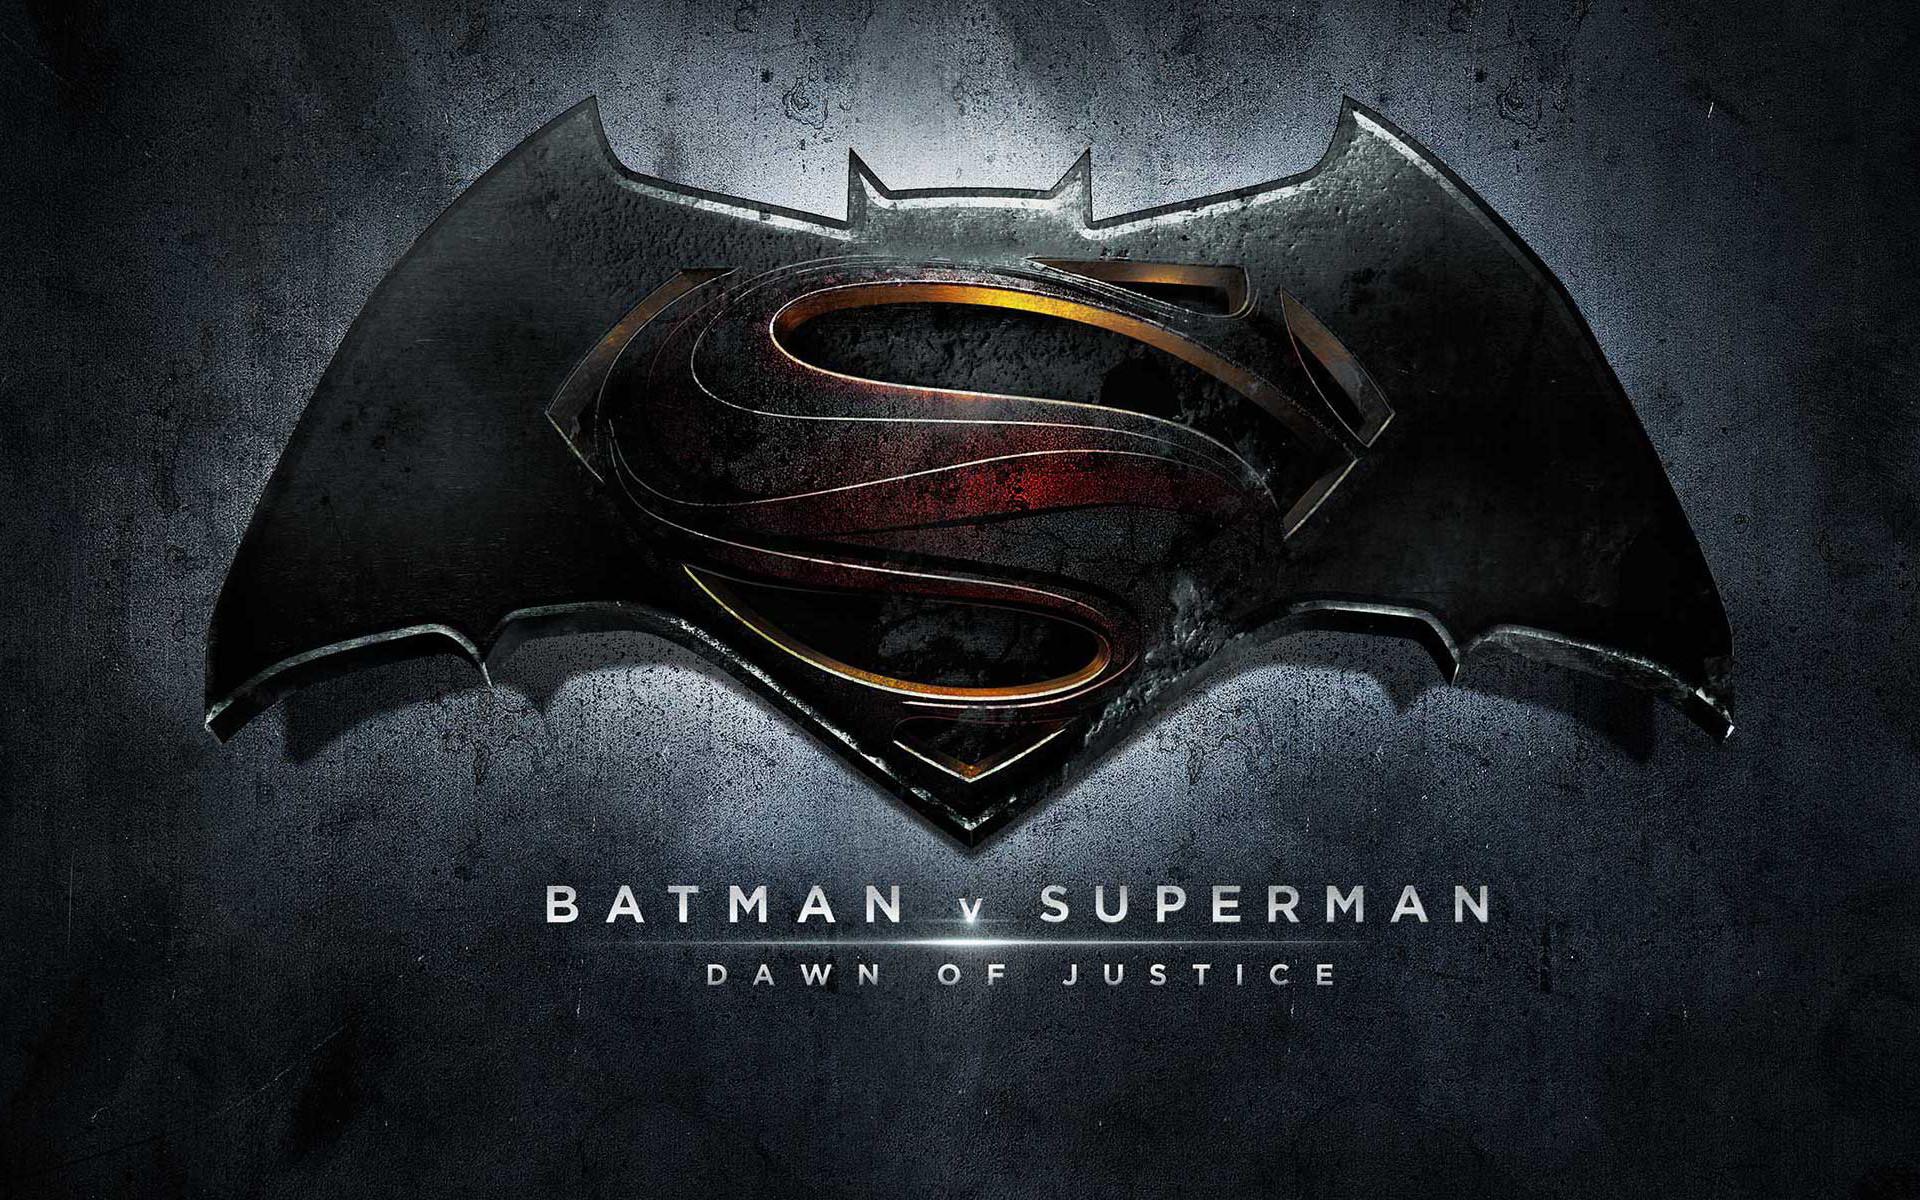 Batman vs Superman Dawn of Justice Logo Exclusive HD Wallpapers #6669